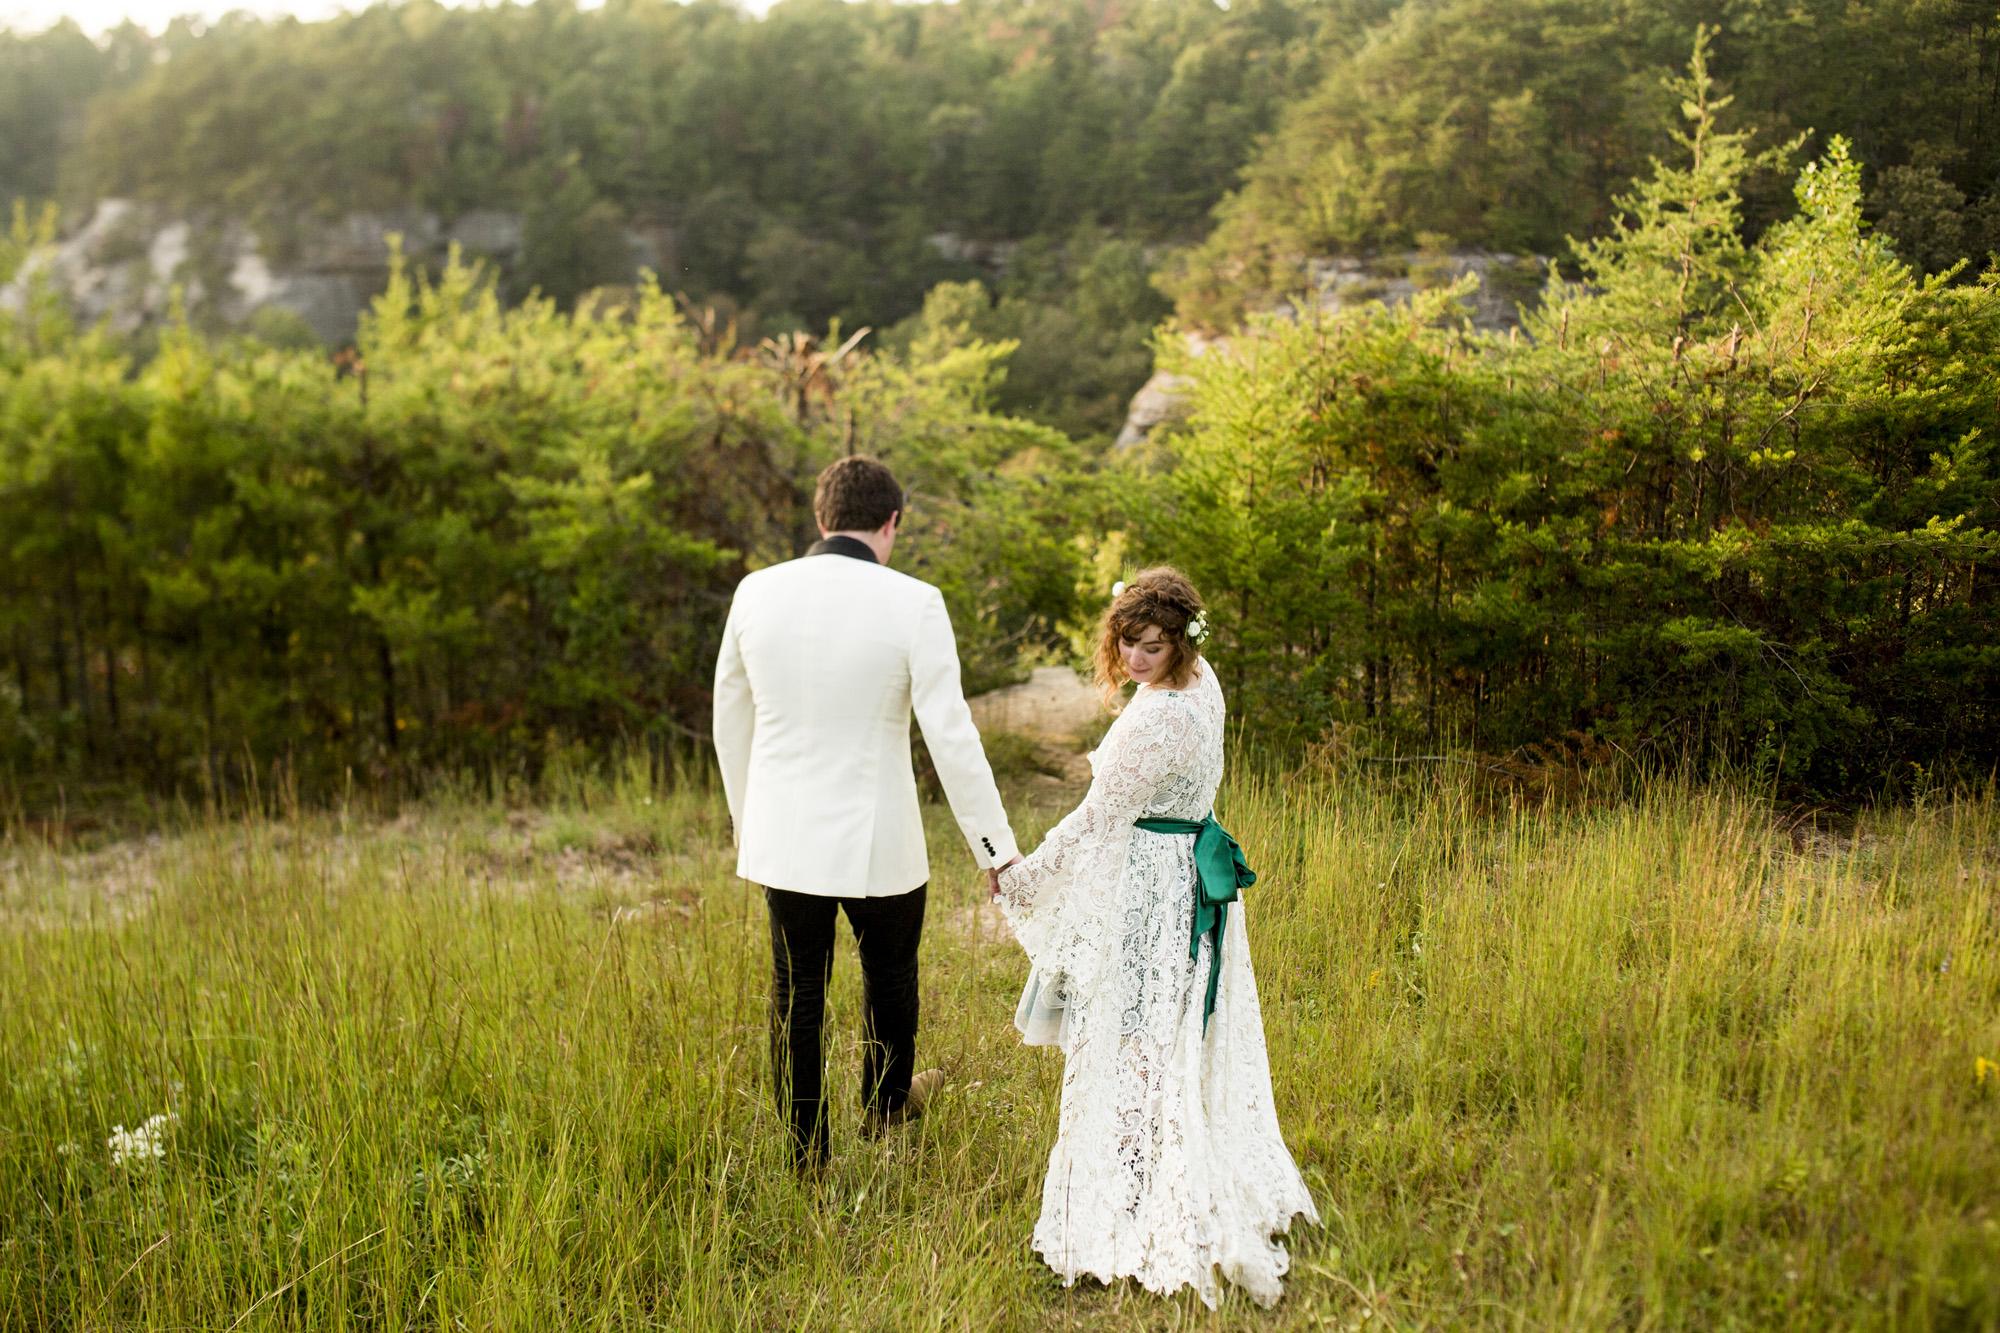 Seriously_Sabrina_Photography_Red_River_Gorge_Kentucky_Wedding_ShawnDana158.jpg